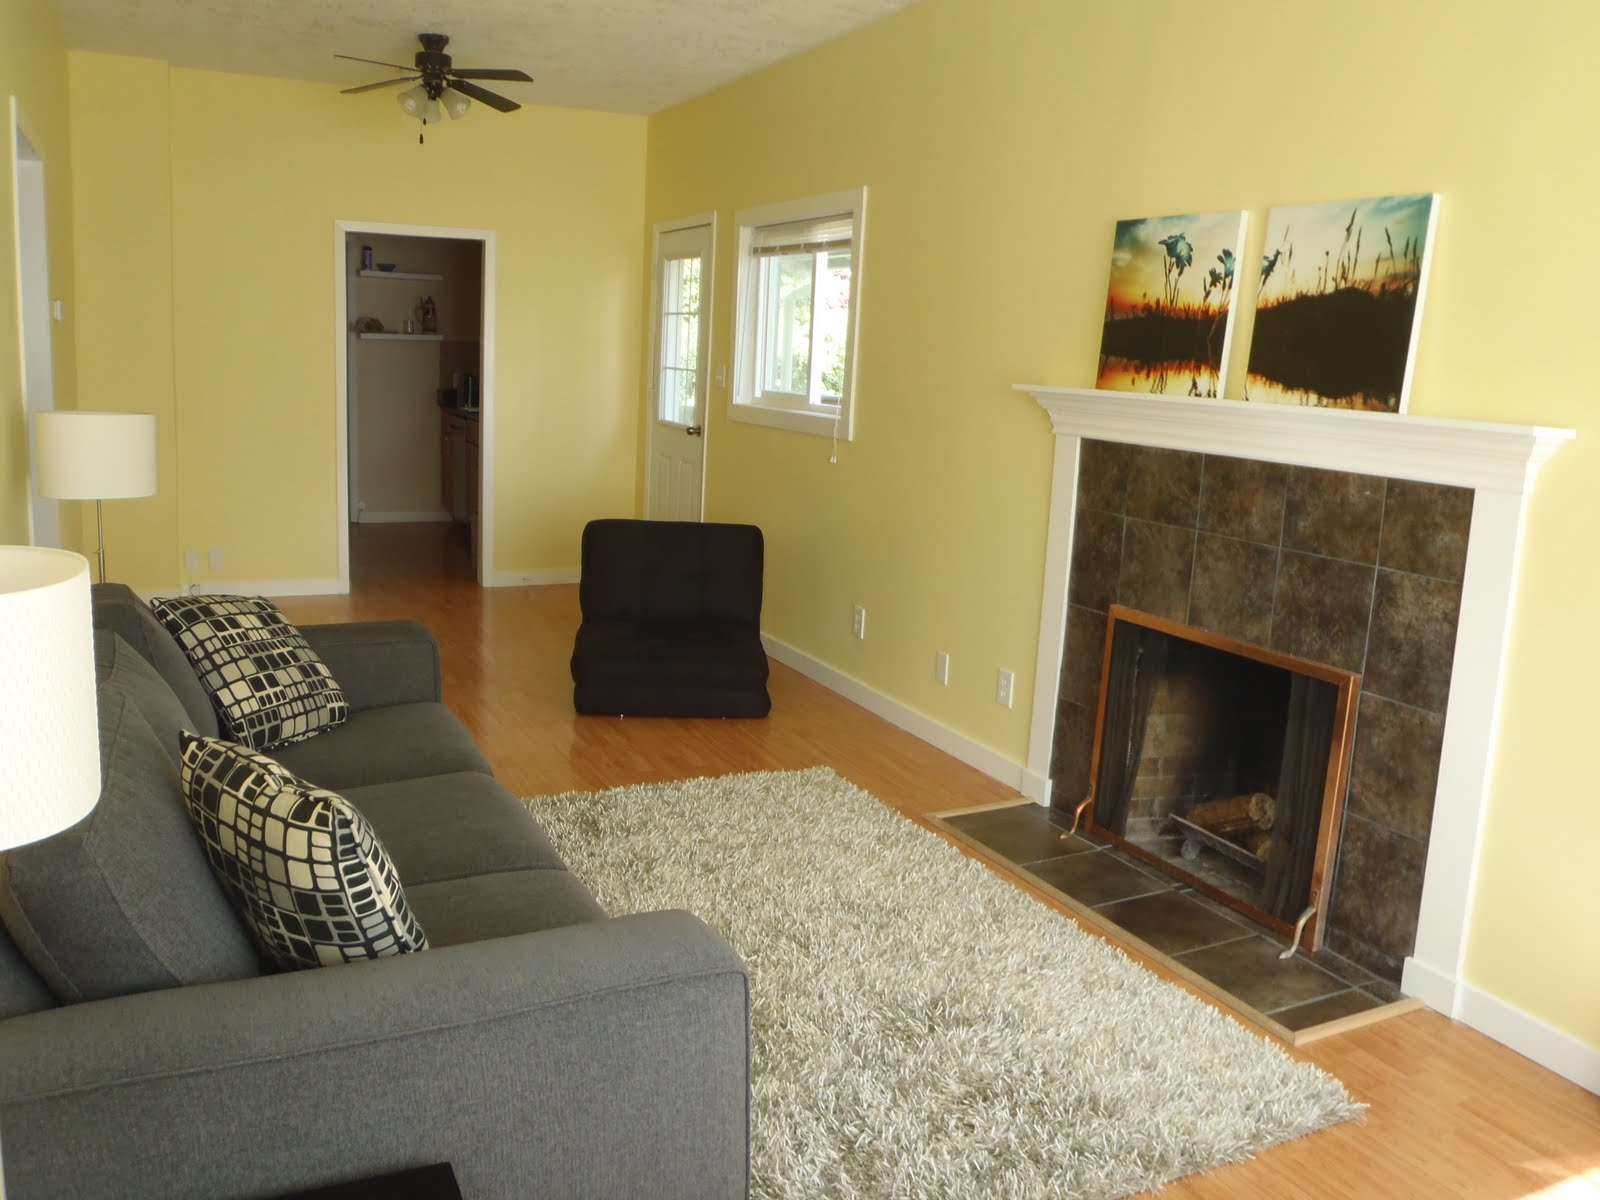 wall color for gray sofa loft miami fl real photo of yellow walls 43 grey rug living